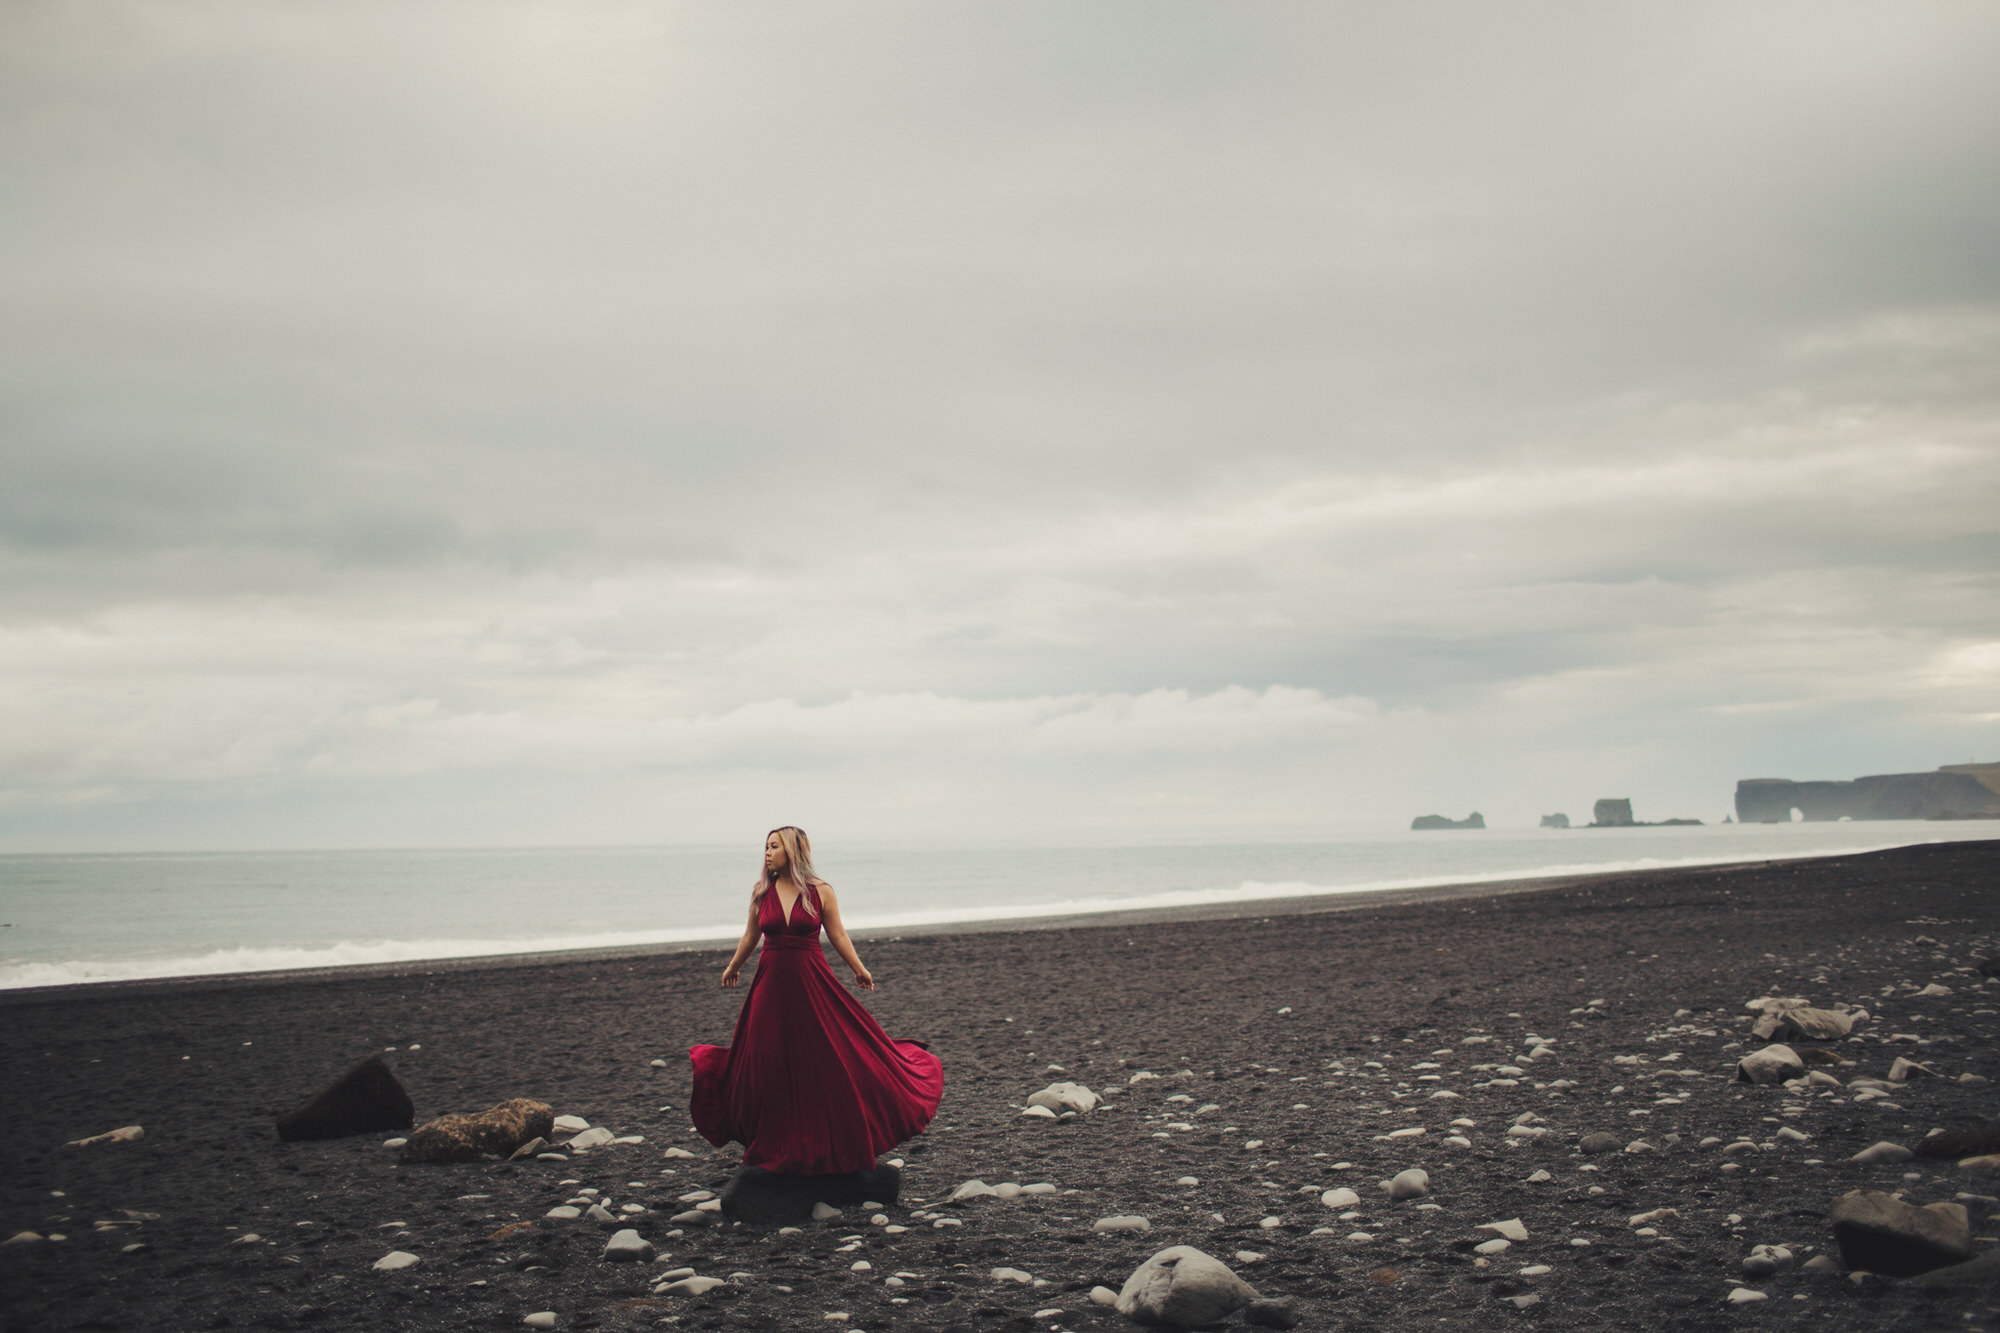 Wedding photographer Reynisfjara beach iceland